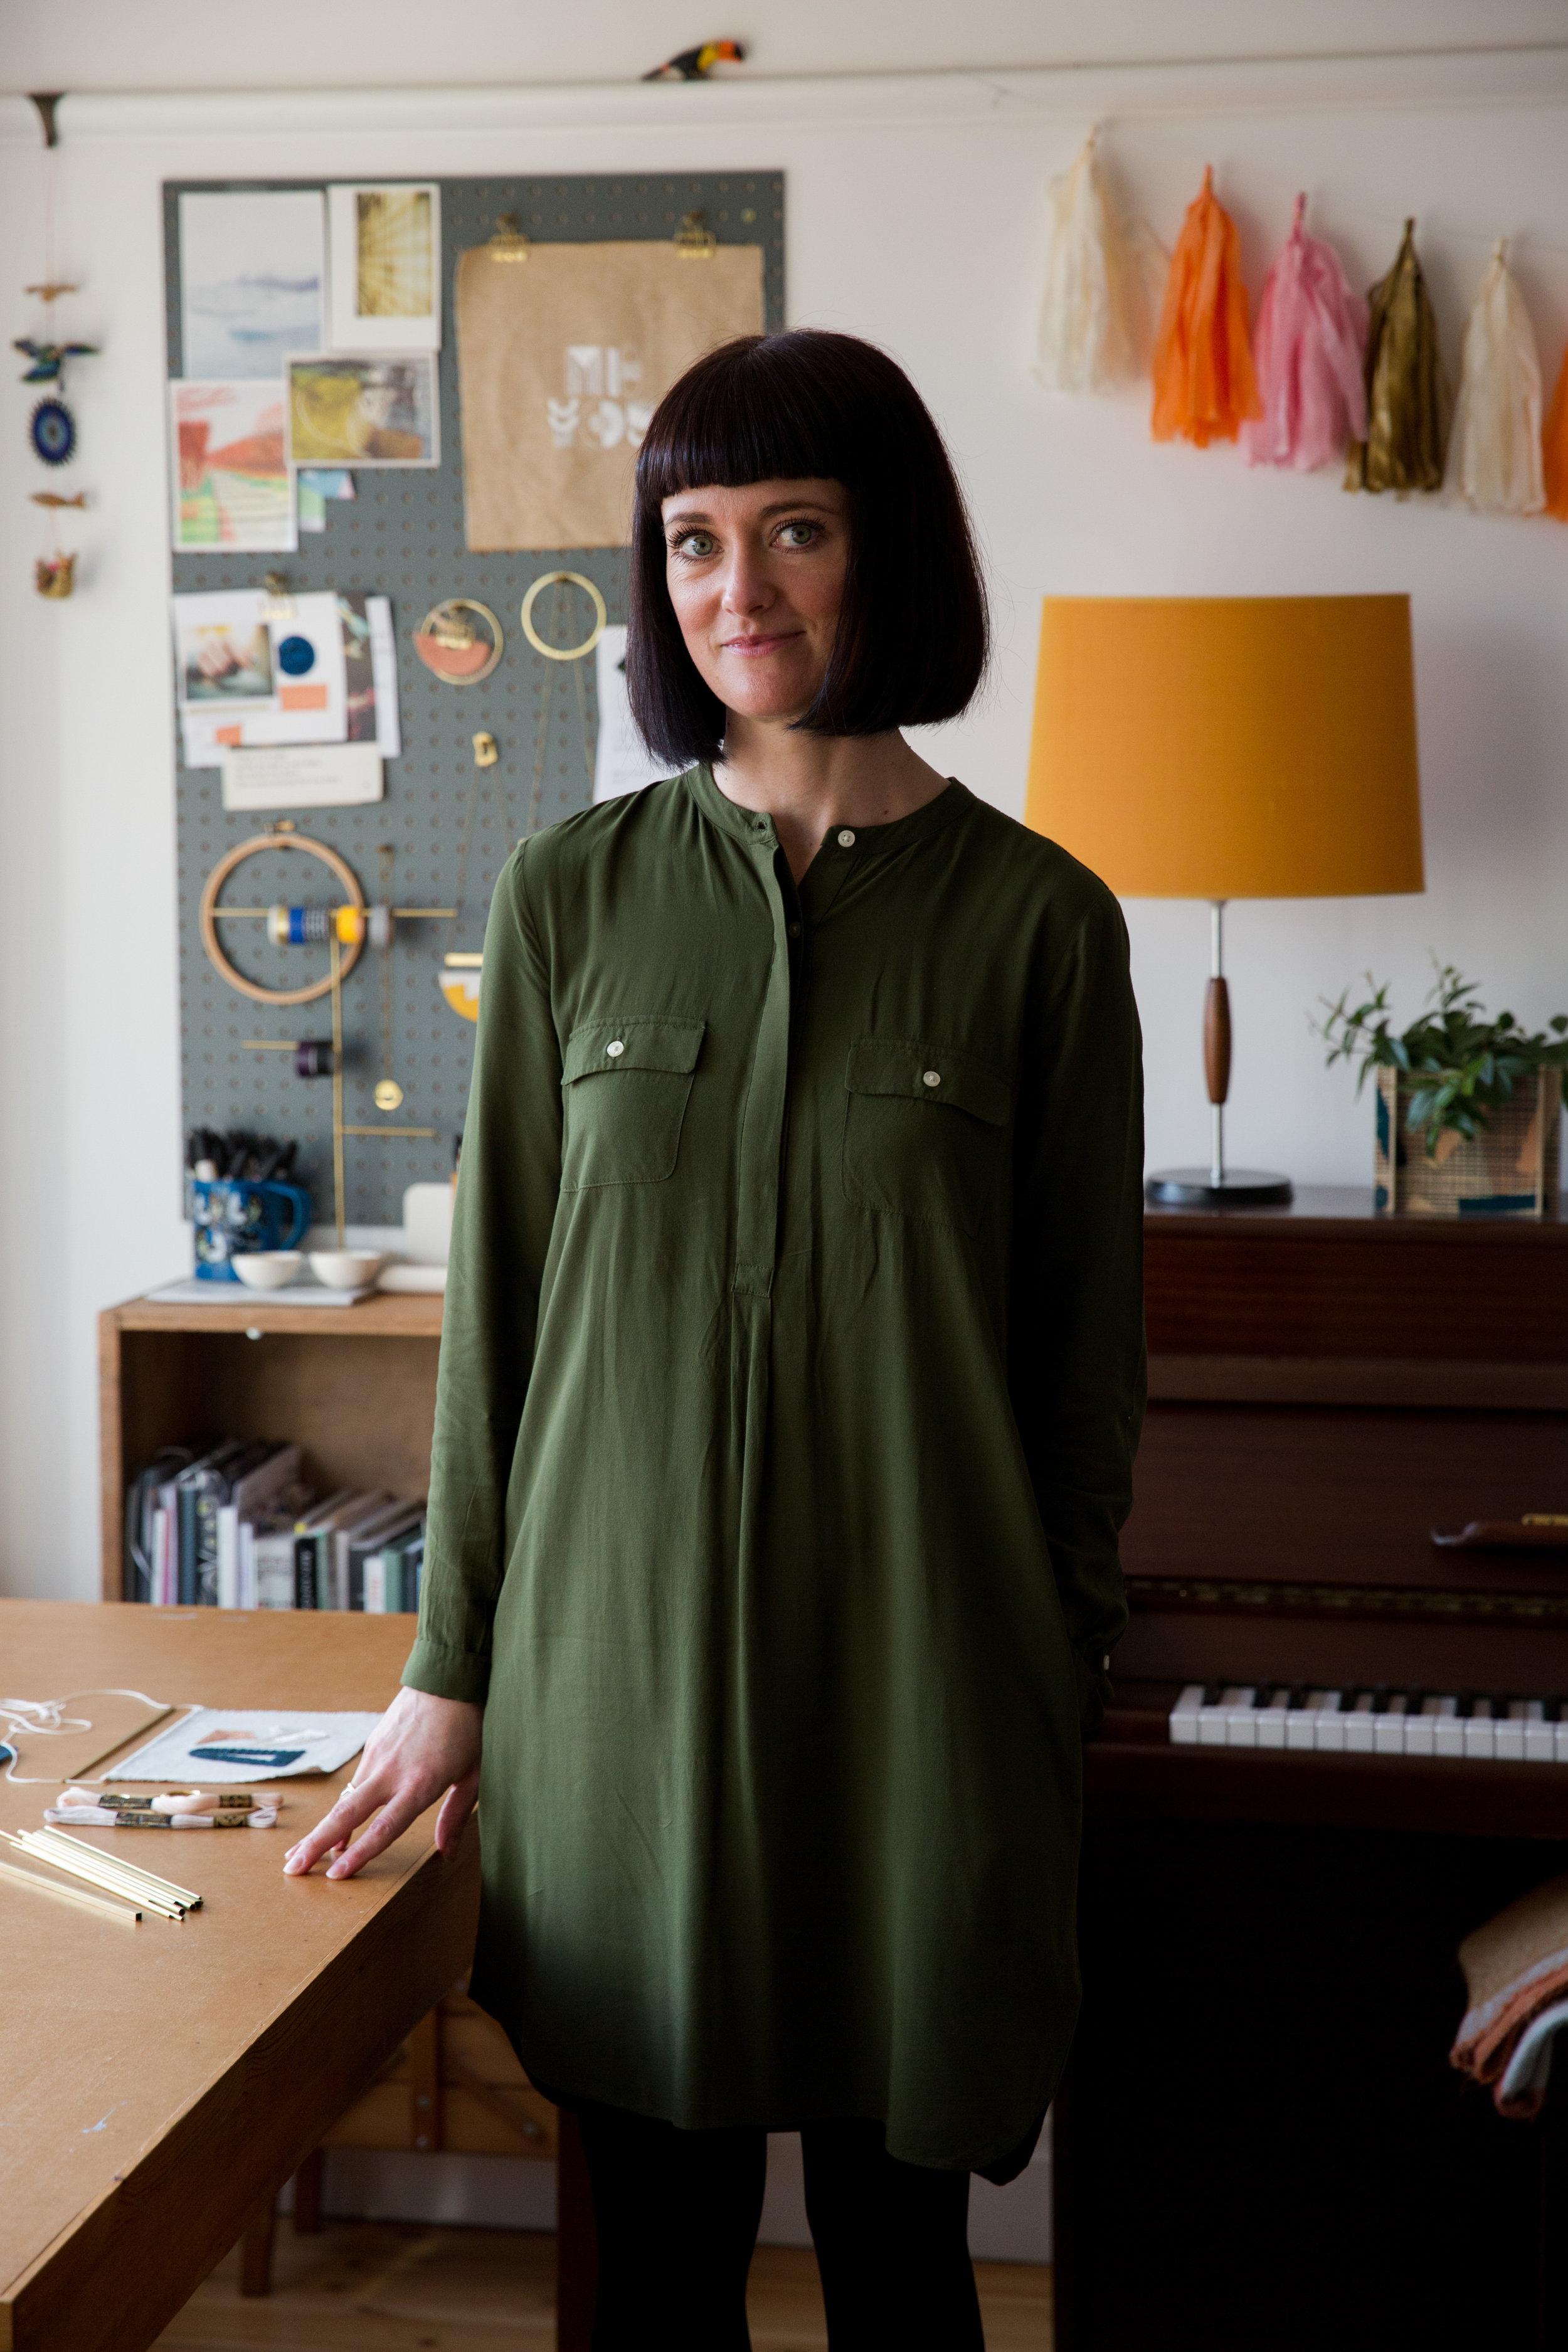 RebeccaHectorClarke-JoanneCrawford-Leeds-Web-105.JPG